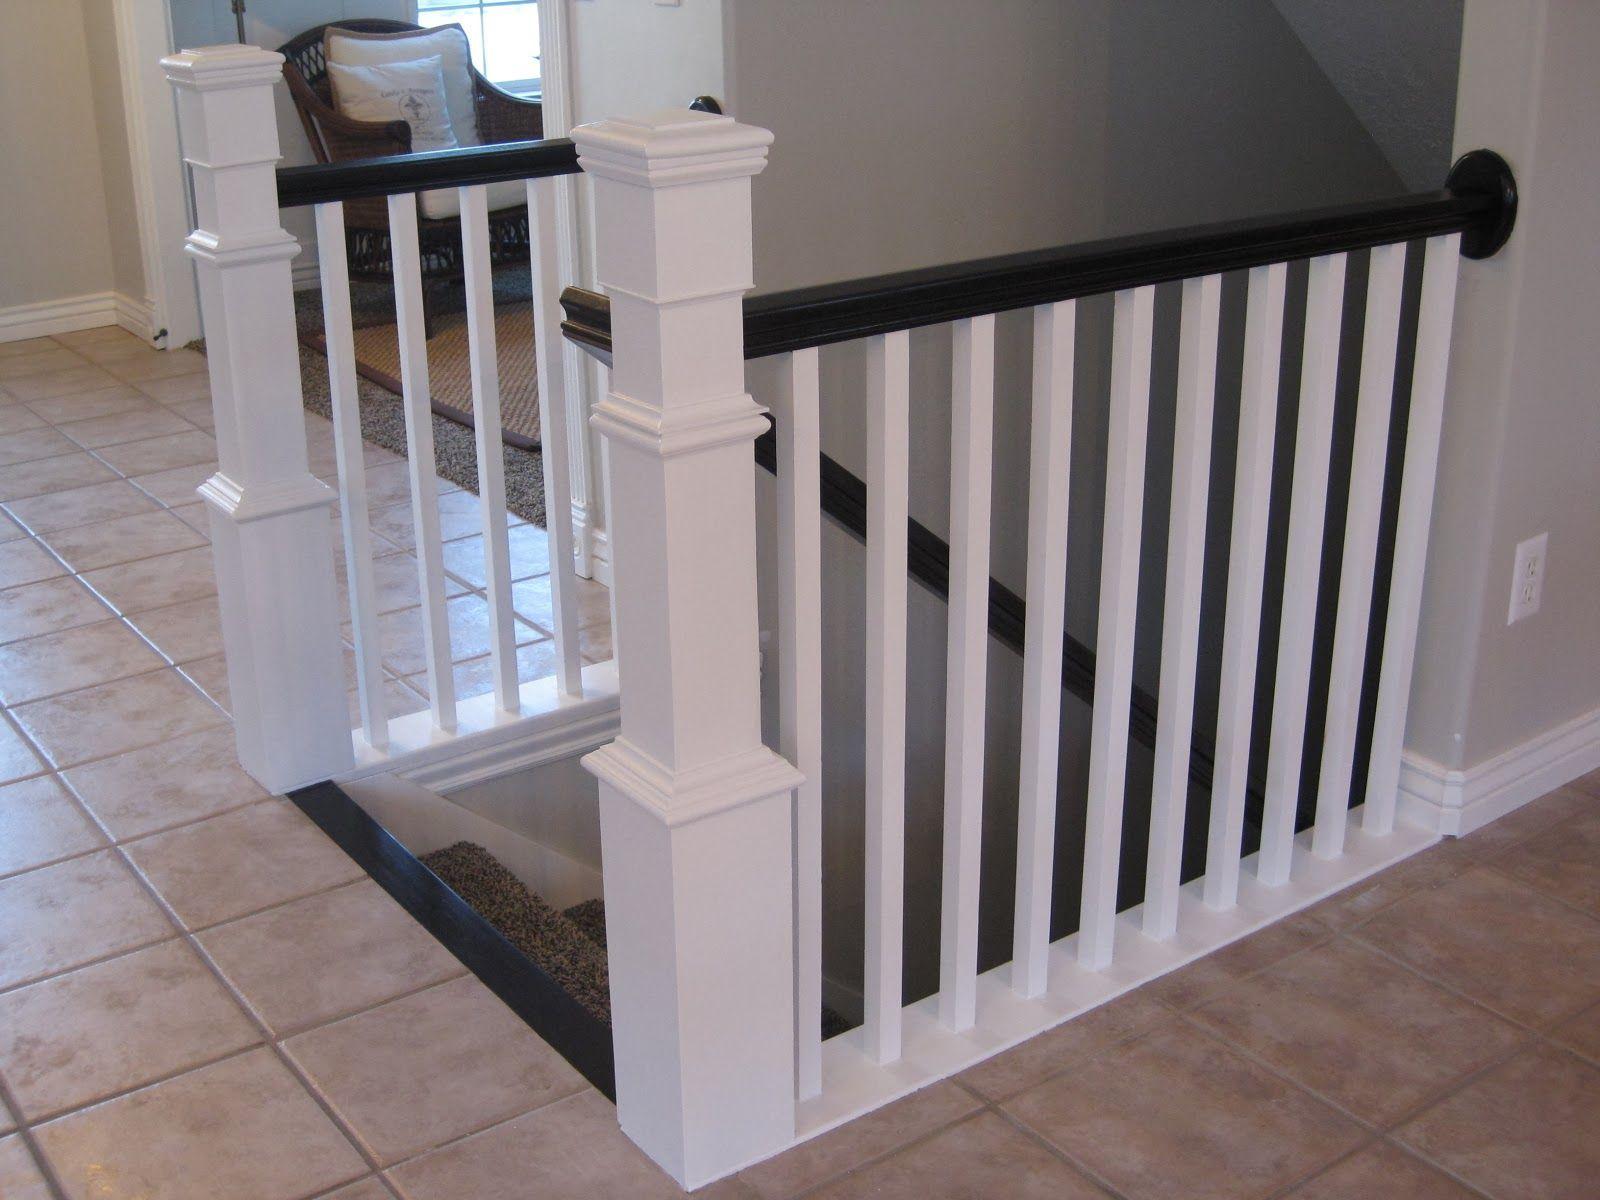 Diy stair banister tutorial part 1 building around